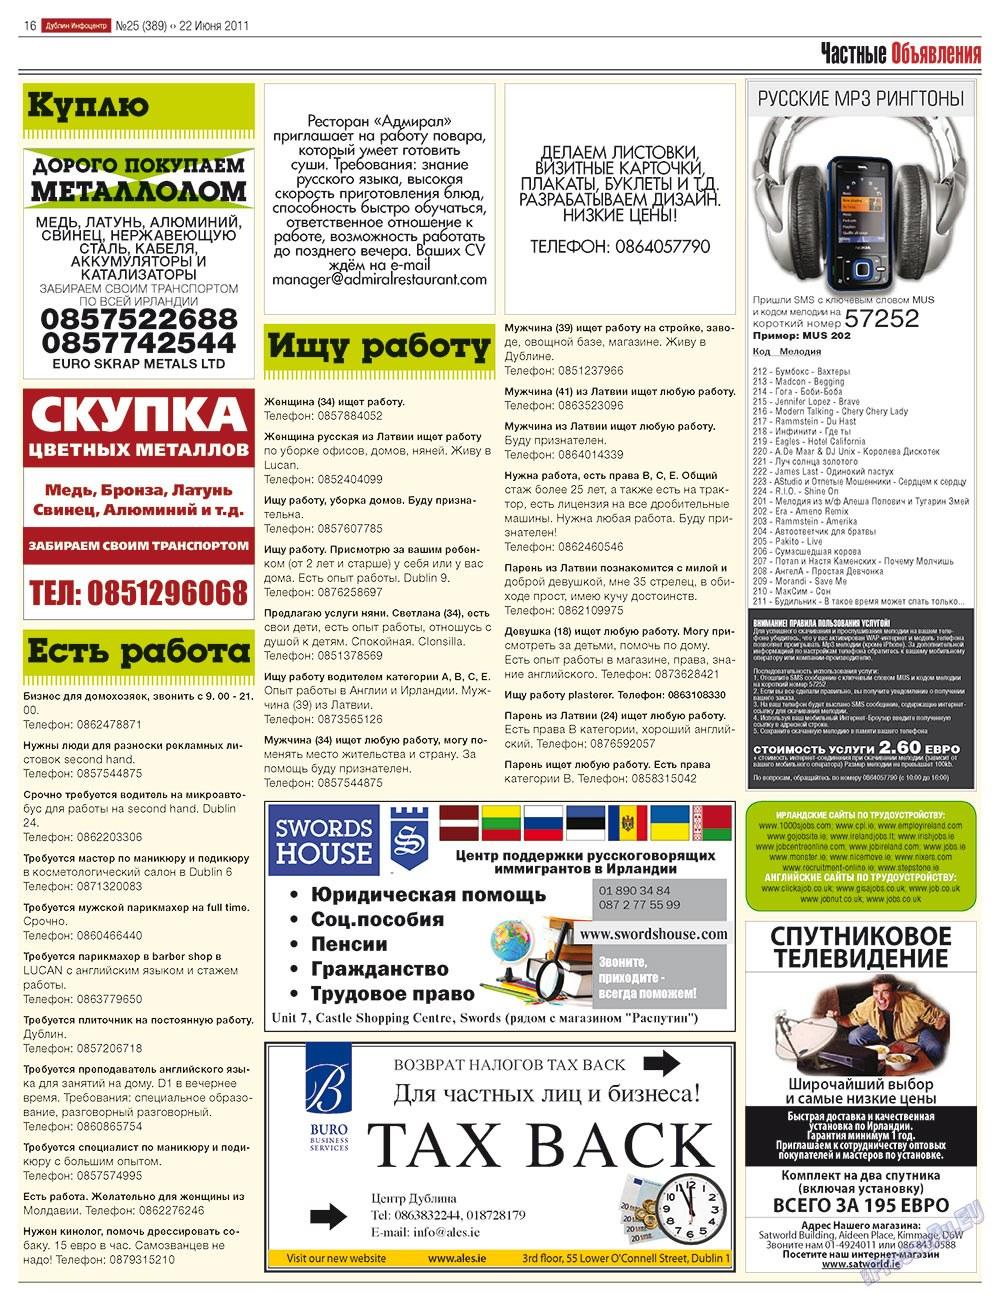 Дублин инфоцентр (газета). 2011 год, номер 25, стр. 16